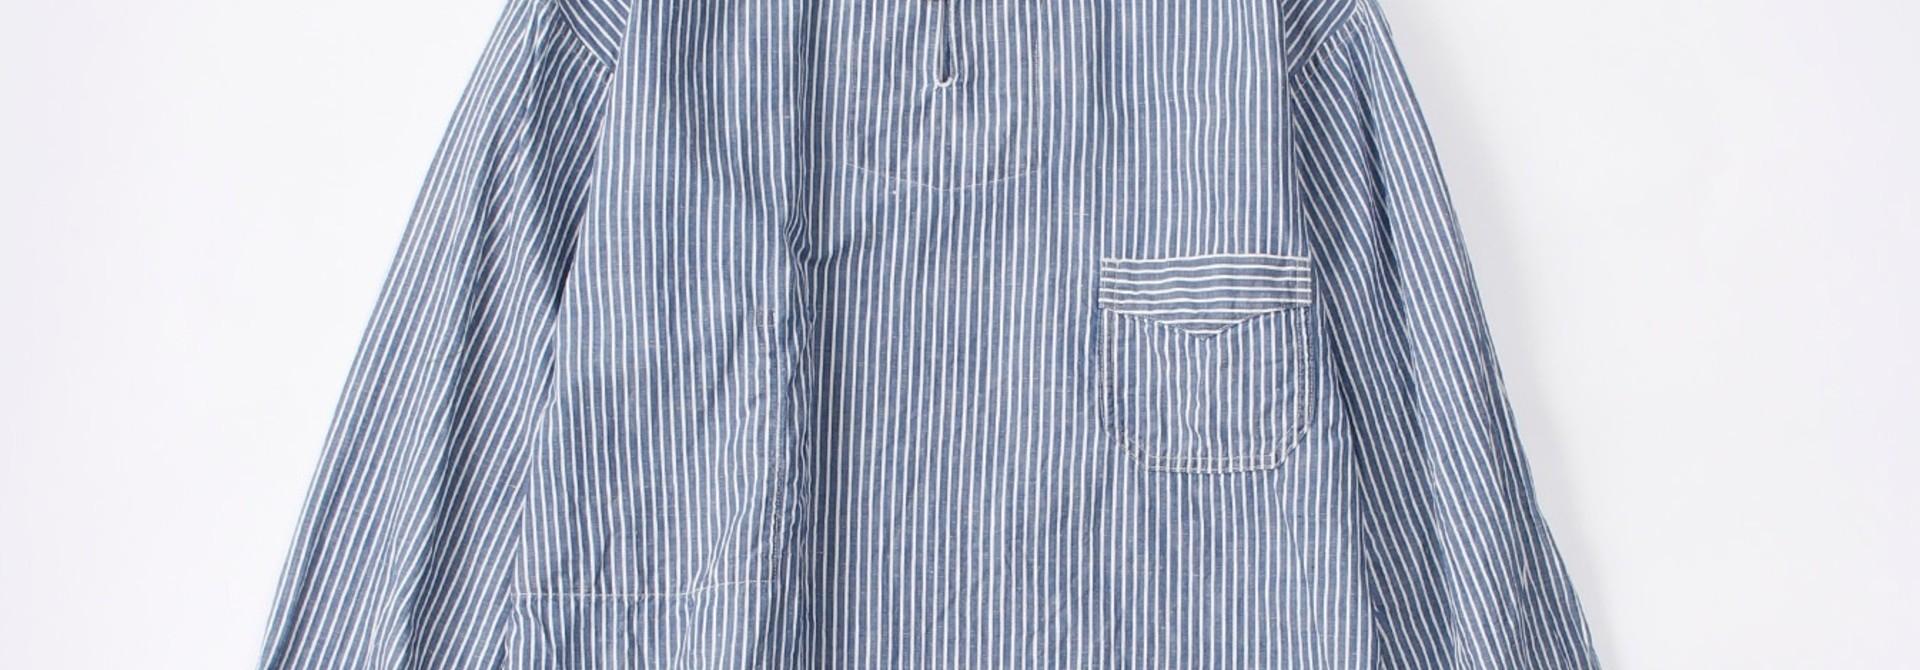 WH Cotton Linen Hickory Umahiko Pullover Shirt